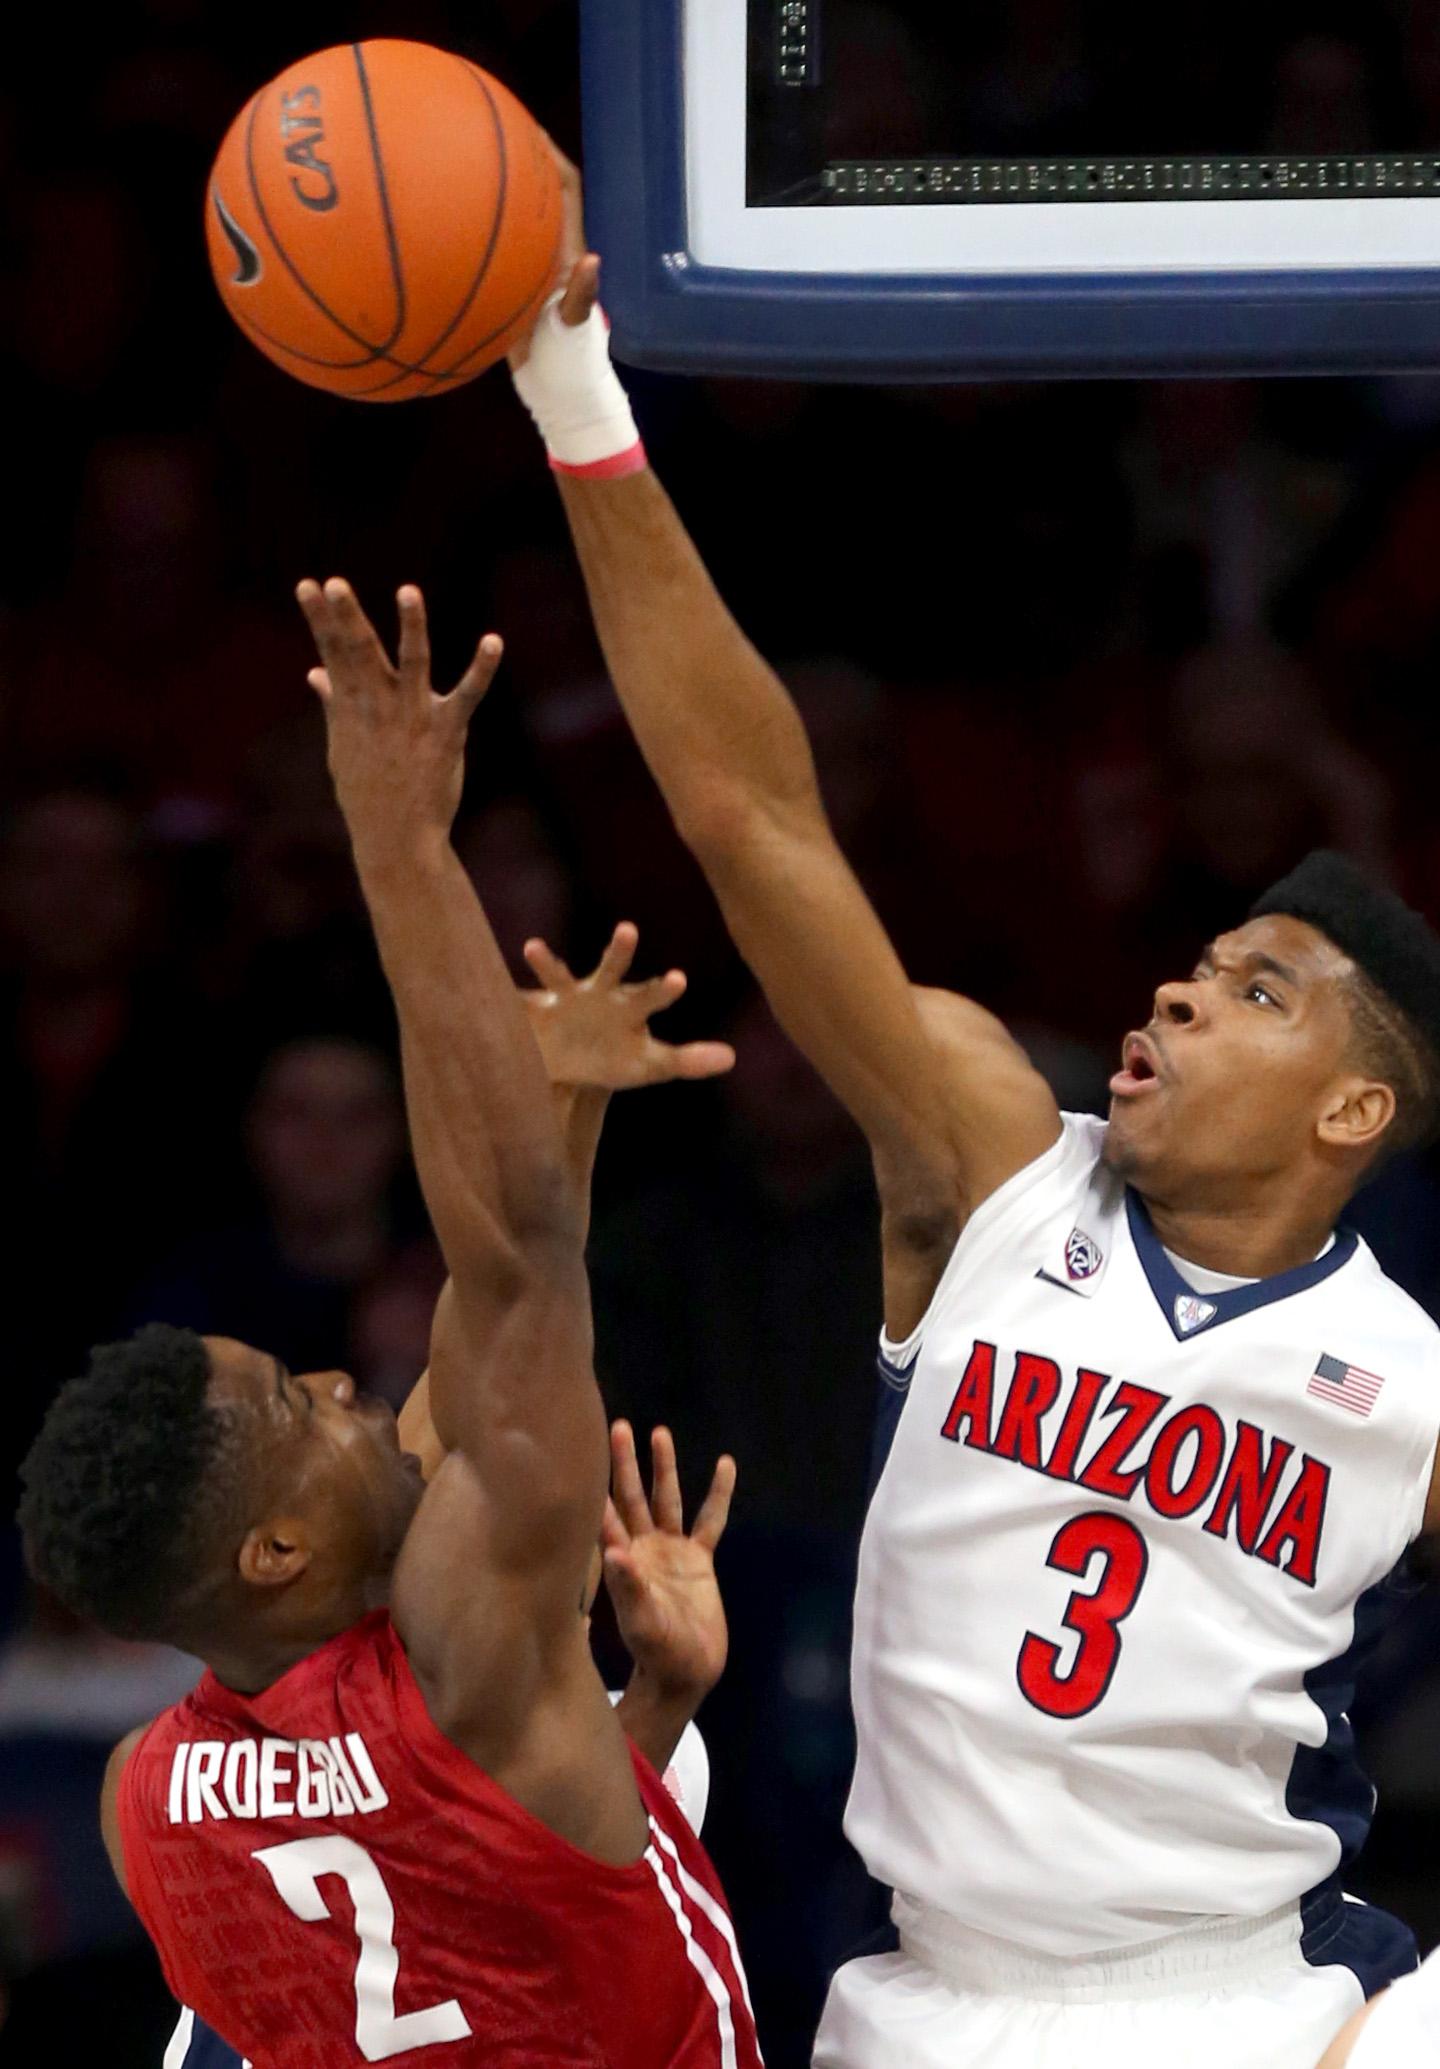 Arizona guard Justin Simon (3) blocks a shot by Washington State guard Ike Iroegbu (2) during an NCAA college basketball game Saturday, Jan. 16, 2016, Tucson, Ariz. (Kelly Presnell/Arizona Daily Star via AP)  ALL LOCAL TELEVISION OUT; PAC-12 OUT; MANDATOR